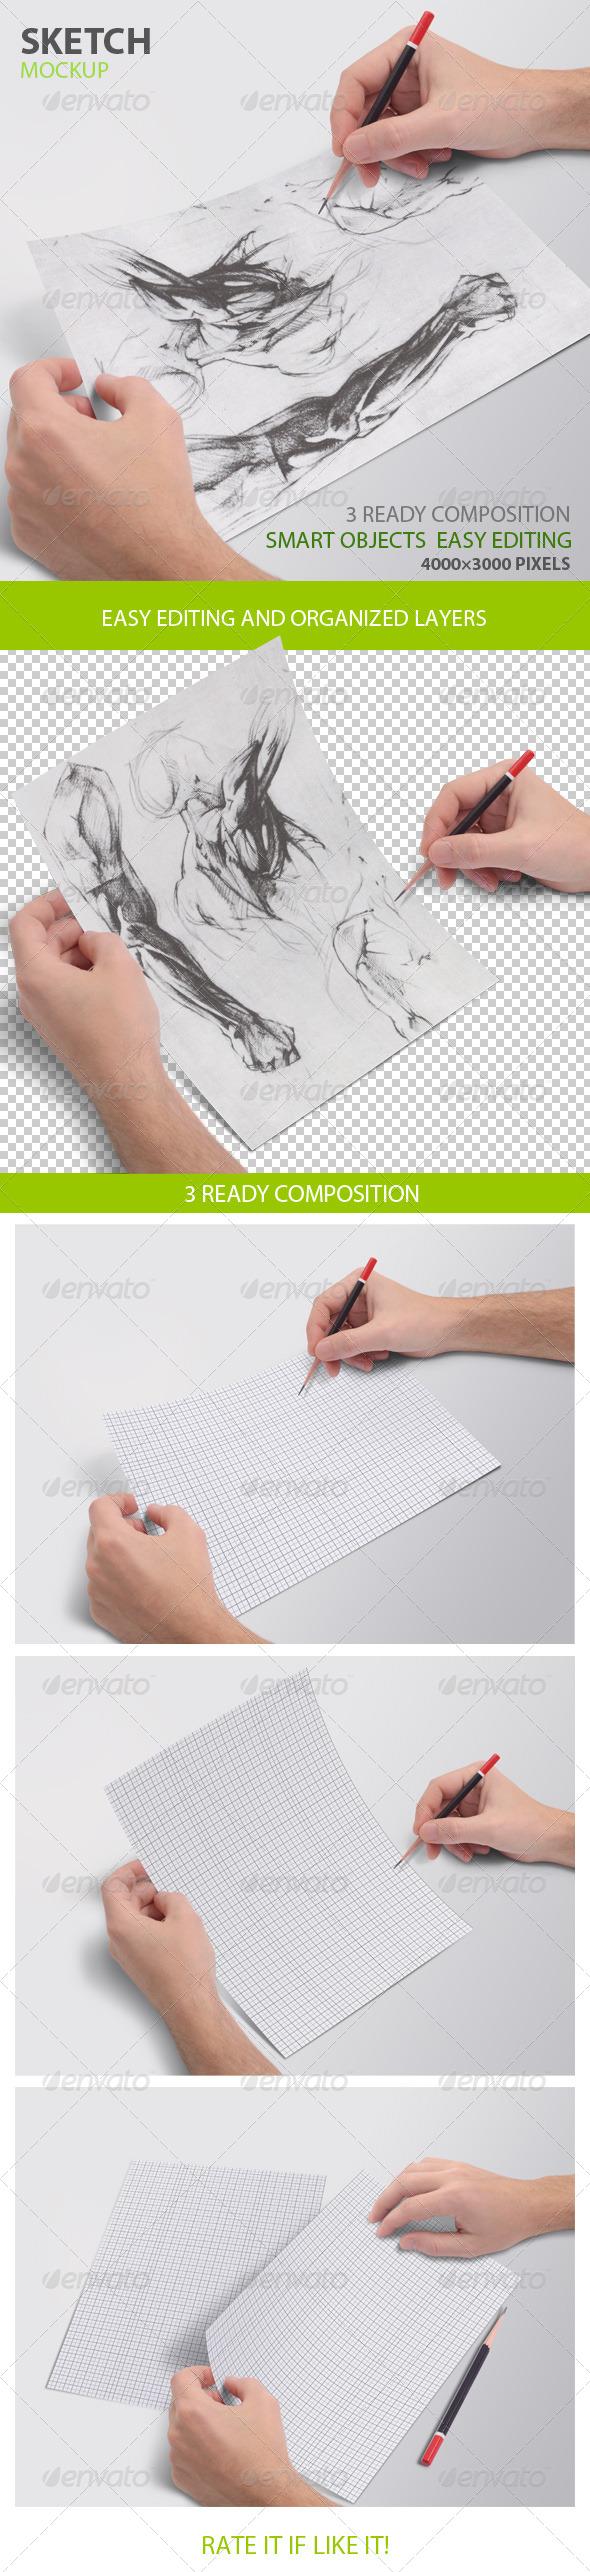 GraphicRiver Sketch mockup 8052775